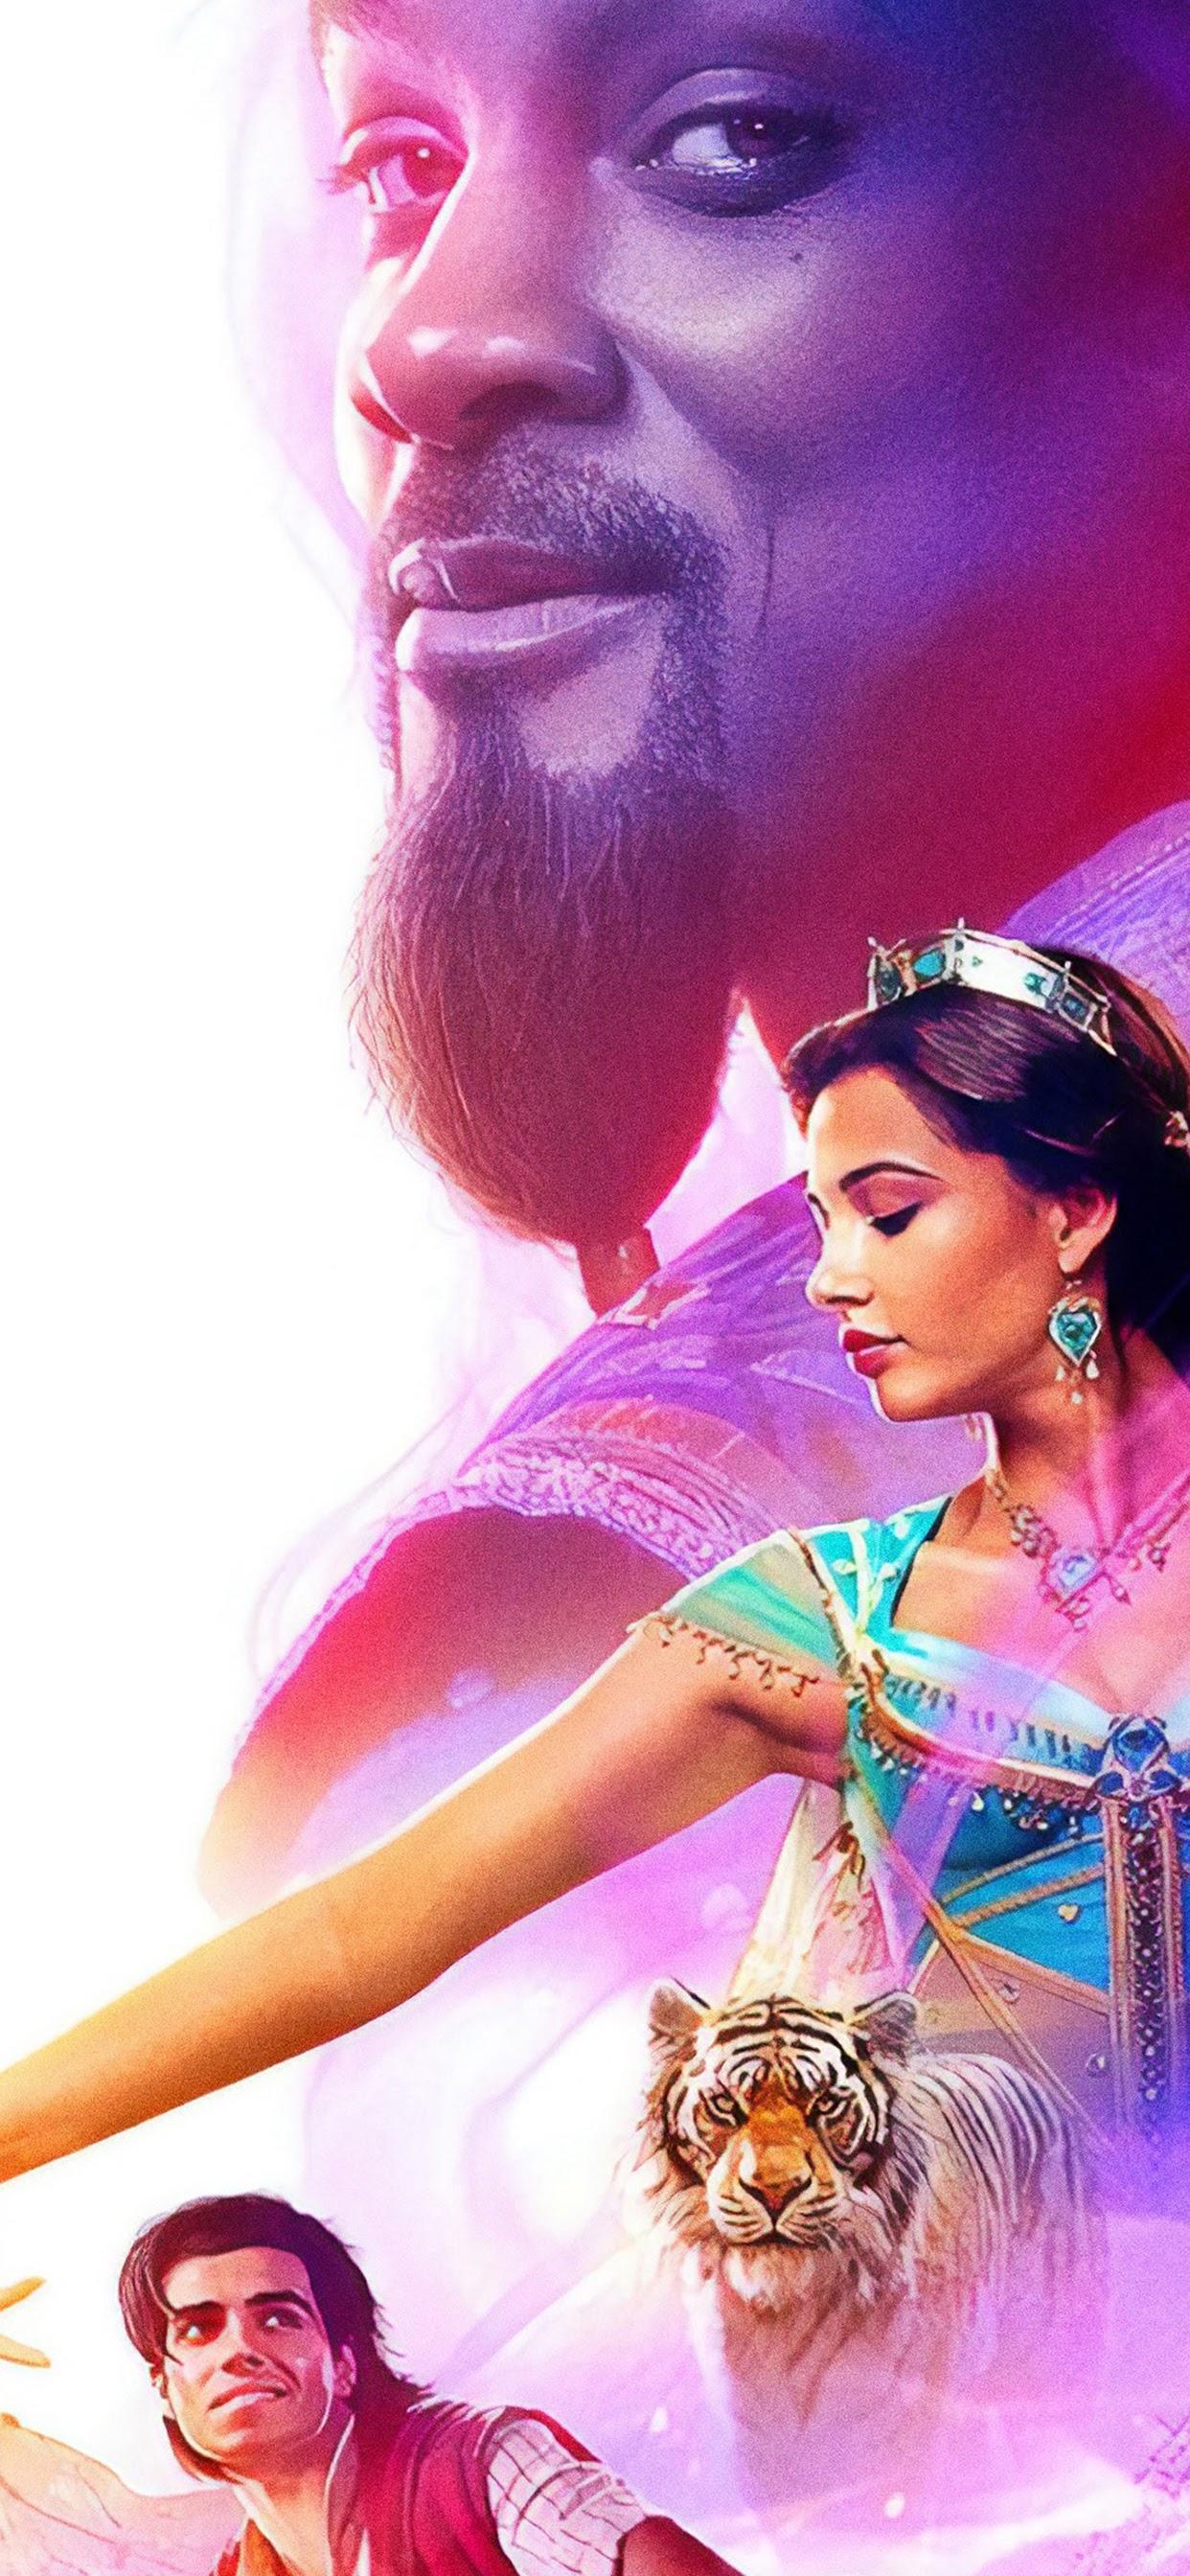 Aladdin 2019 Characters 4k Wallpaper 6